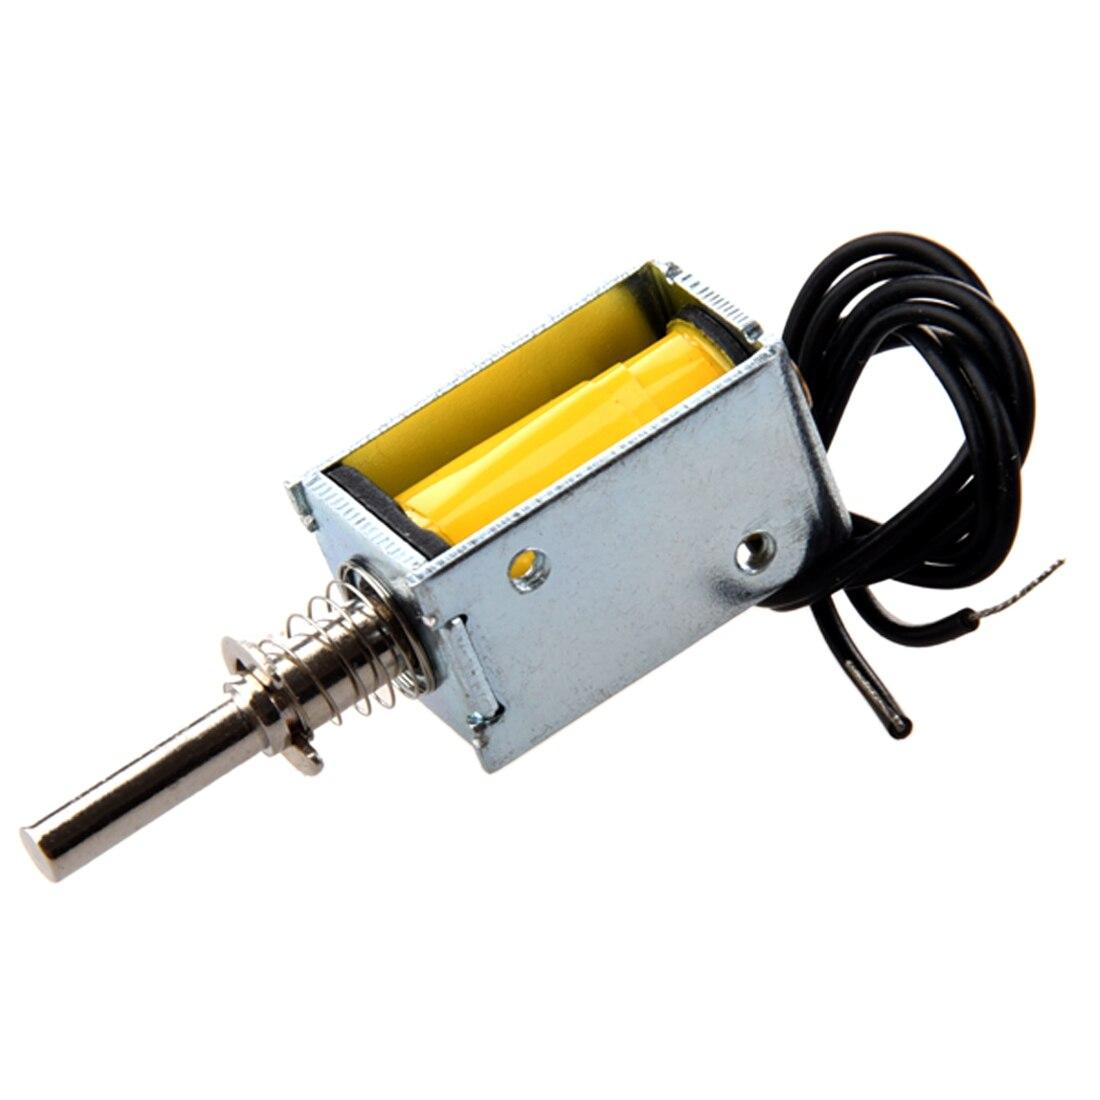 все цены на DC 4.5V 40g/2mm Open Frame Actuator Push Pull Solenoid Electromagnet